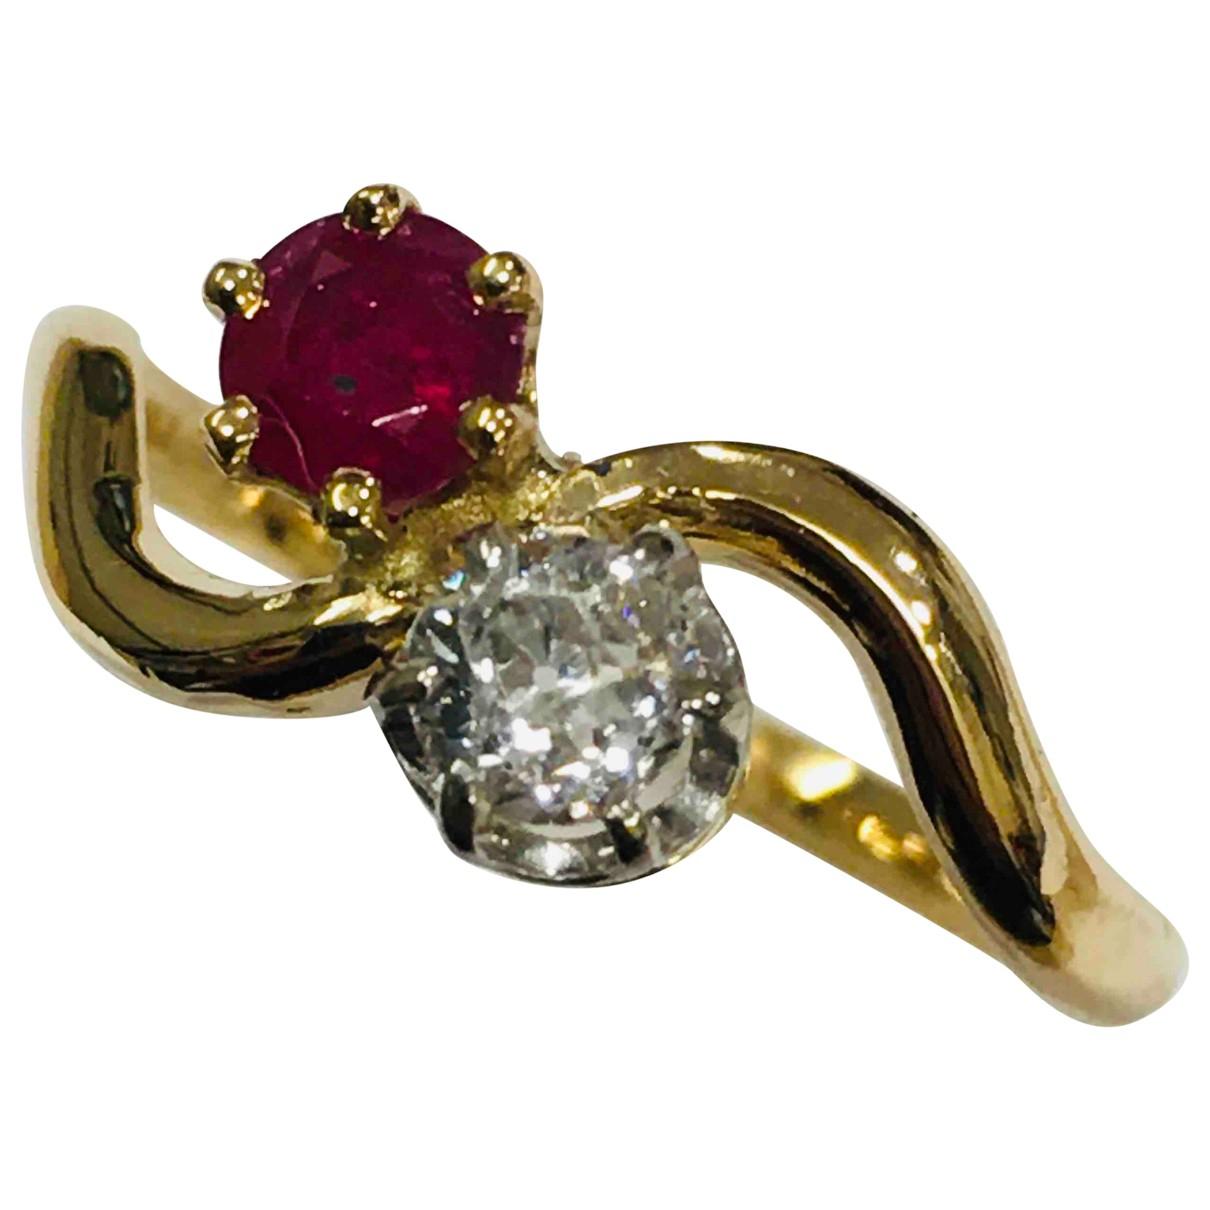 - Bague Toi & Moi pour femme en or rose - rose